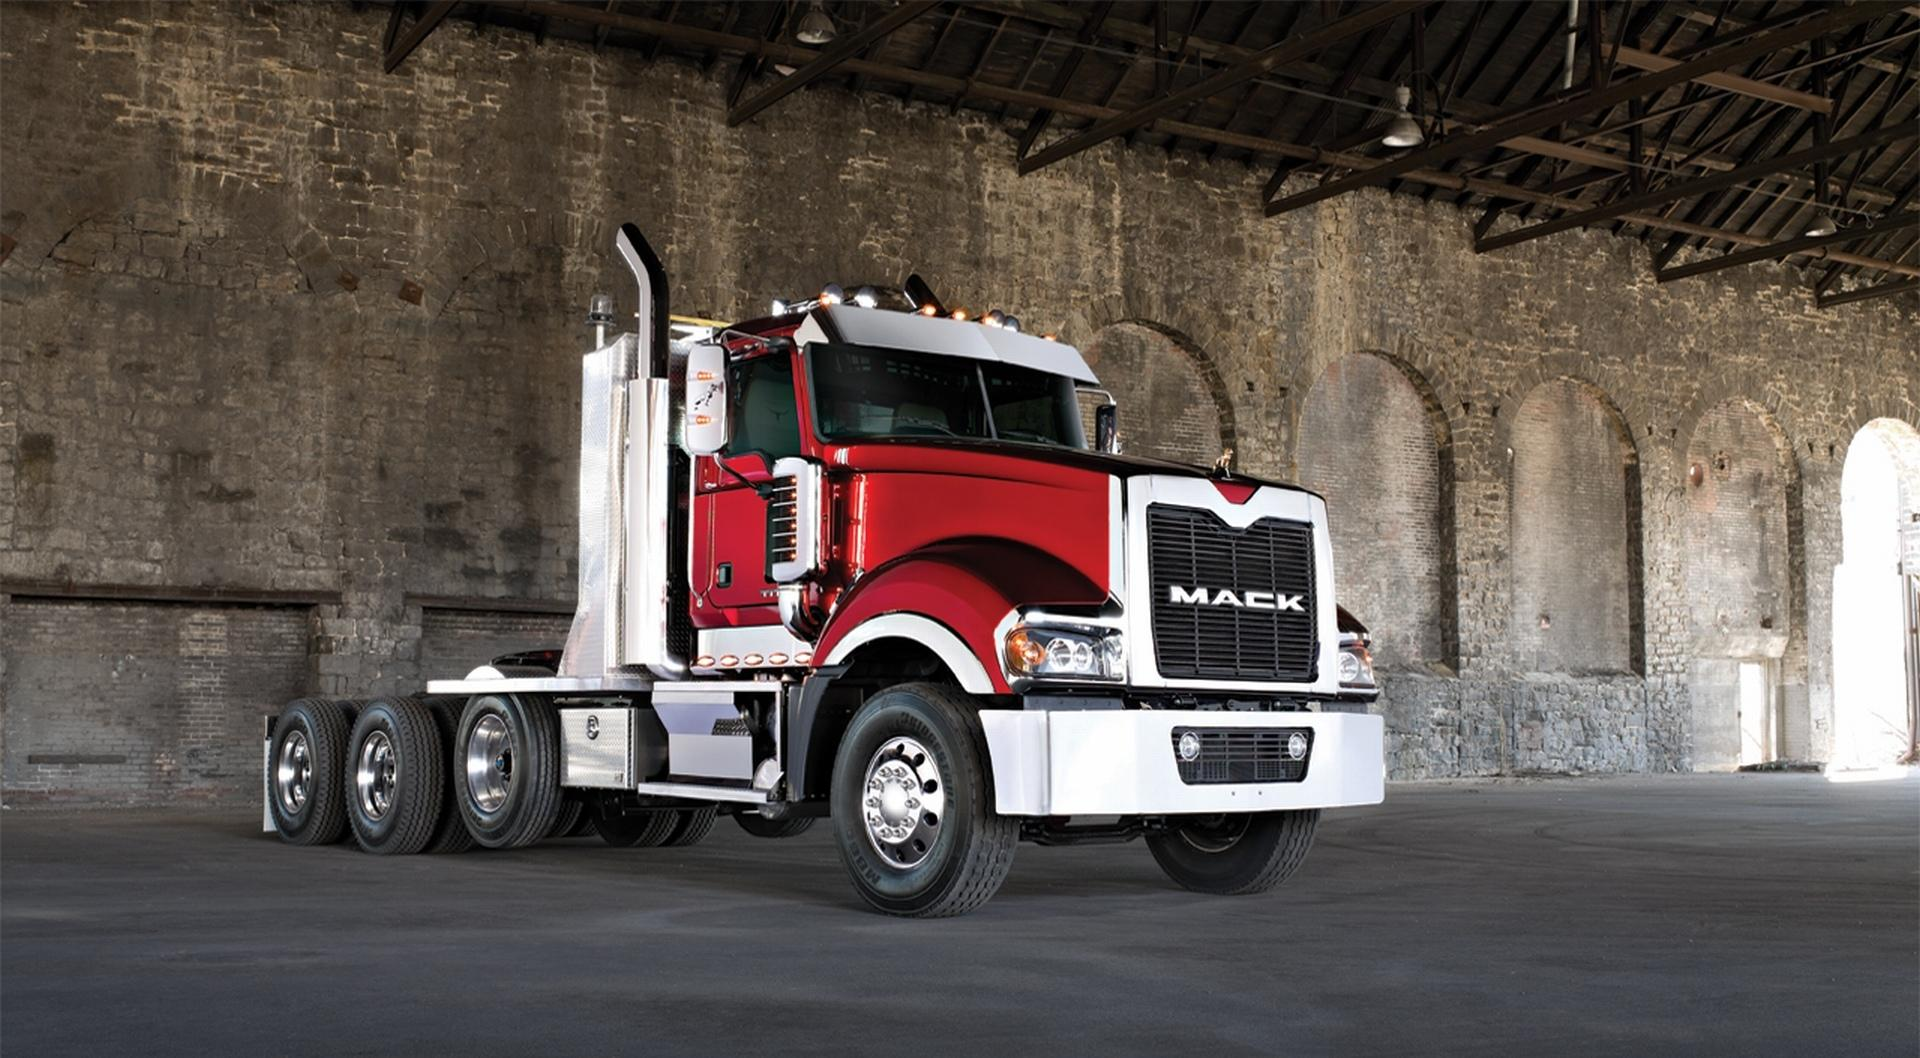 Mack Trucks wallpapers HD quality